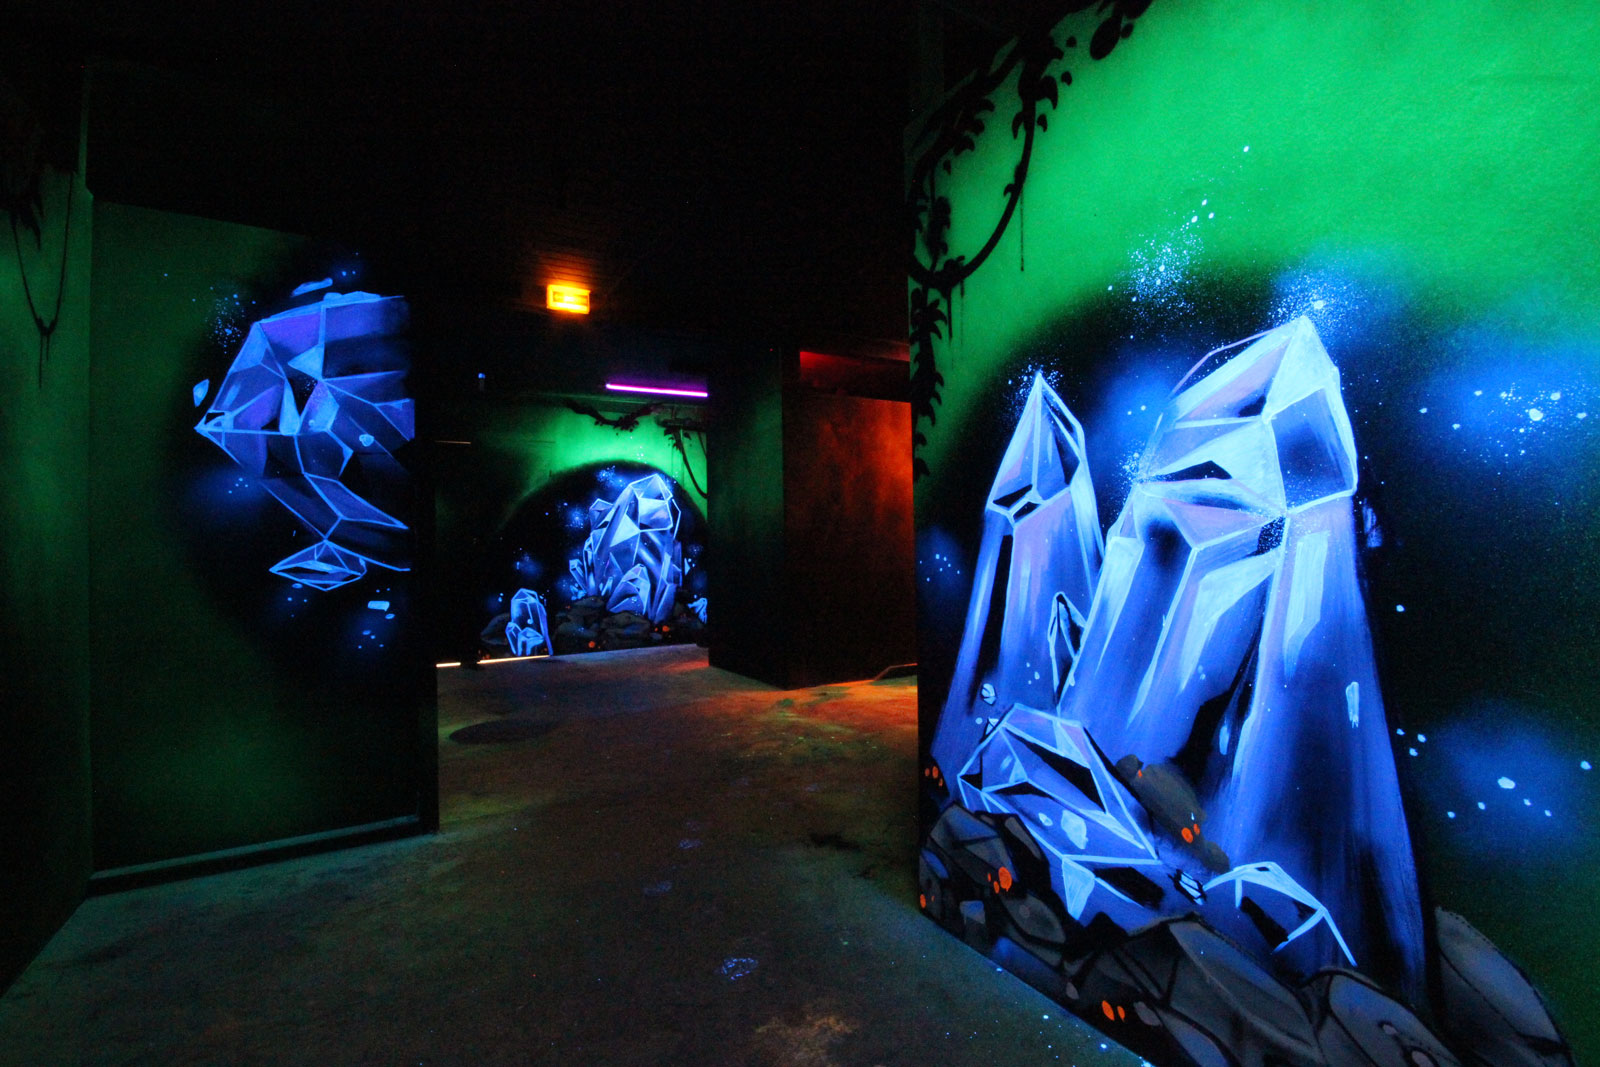 La salle de Laser Game de la Funky Factory - image 6